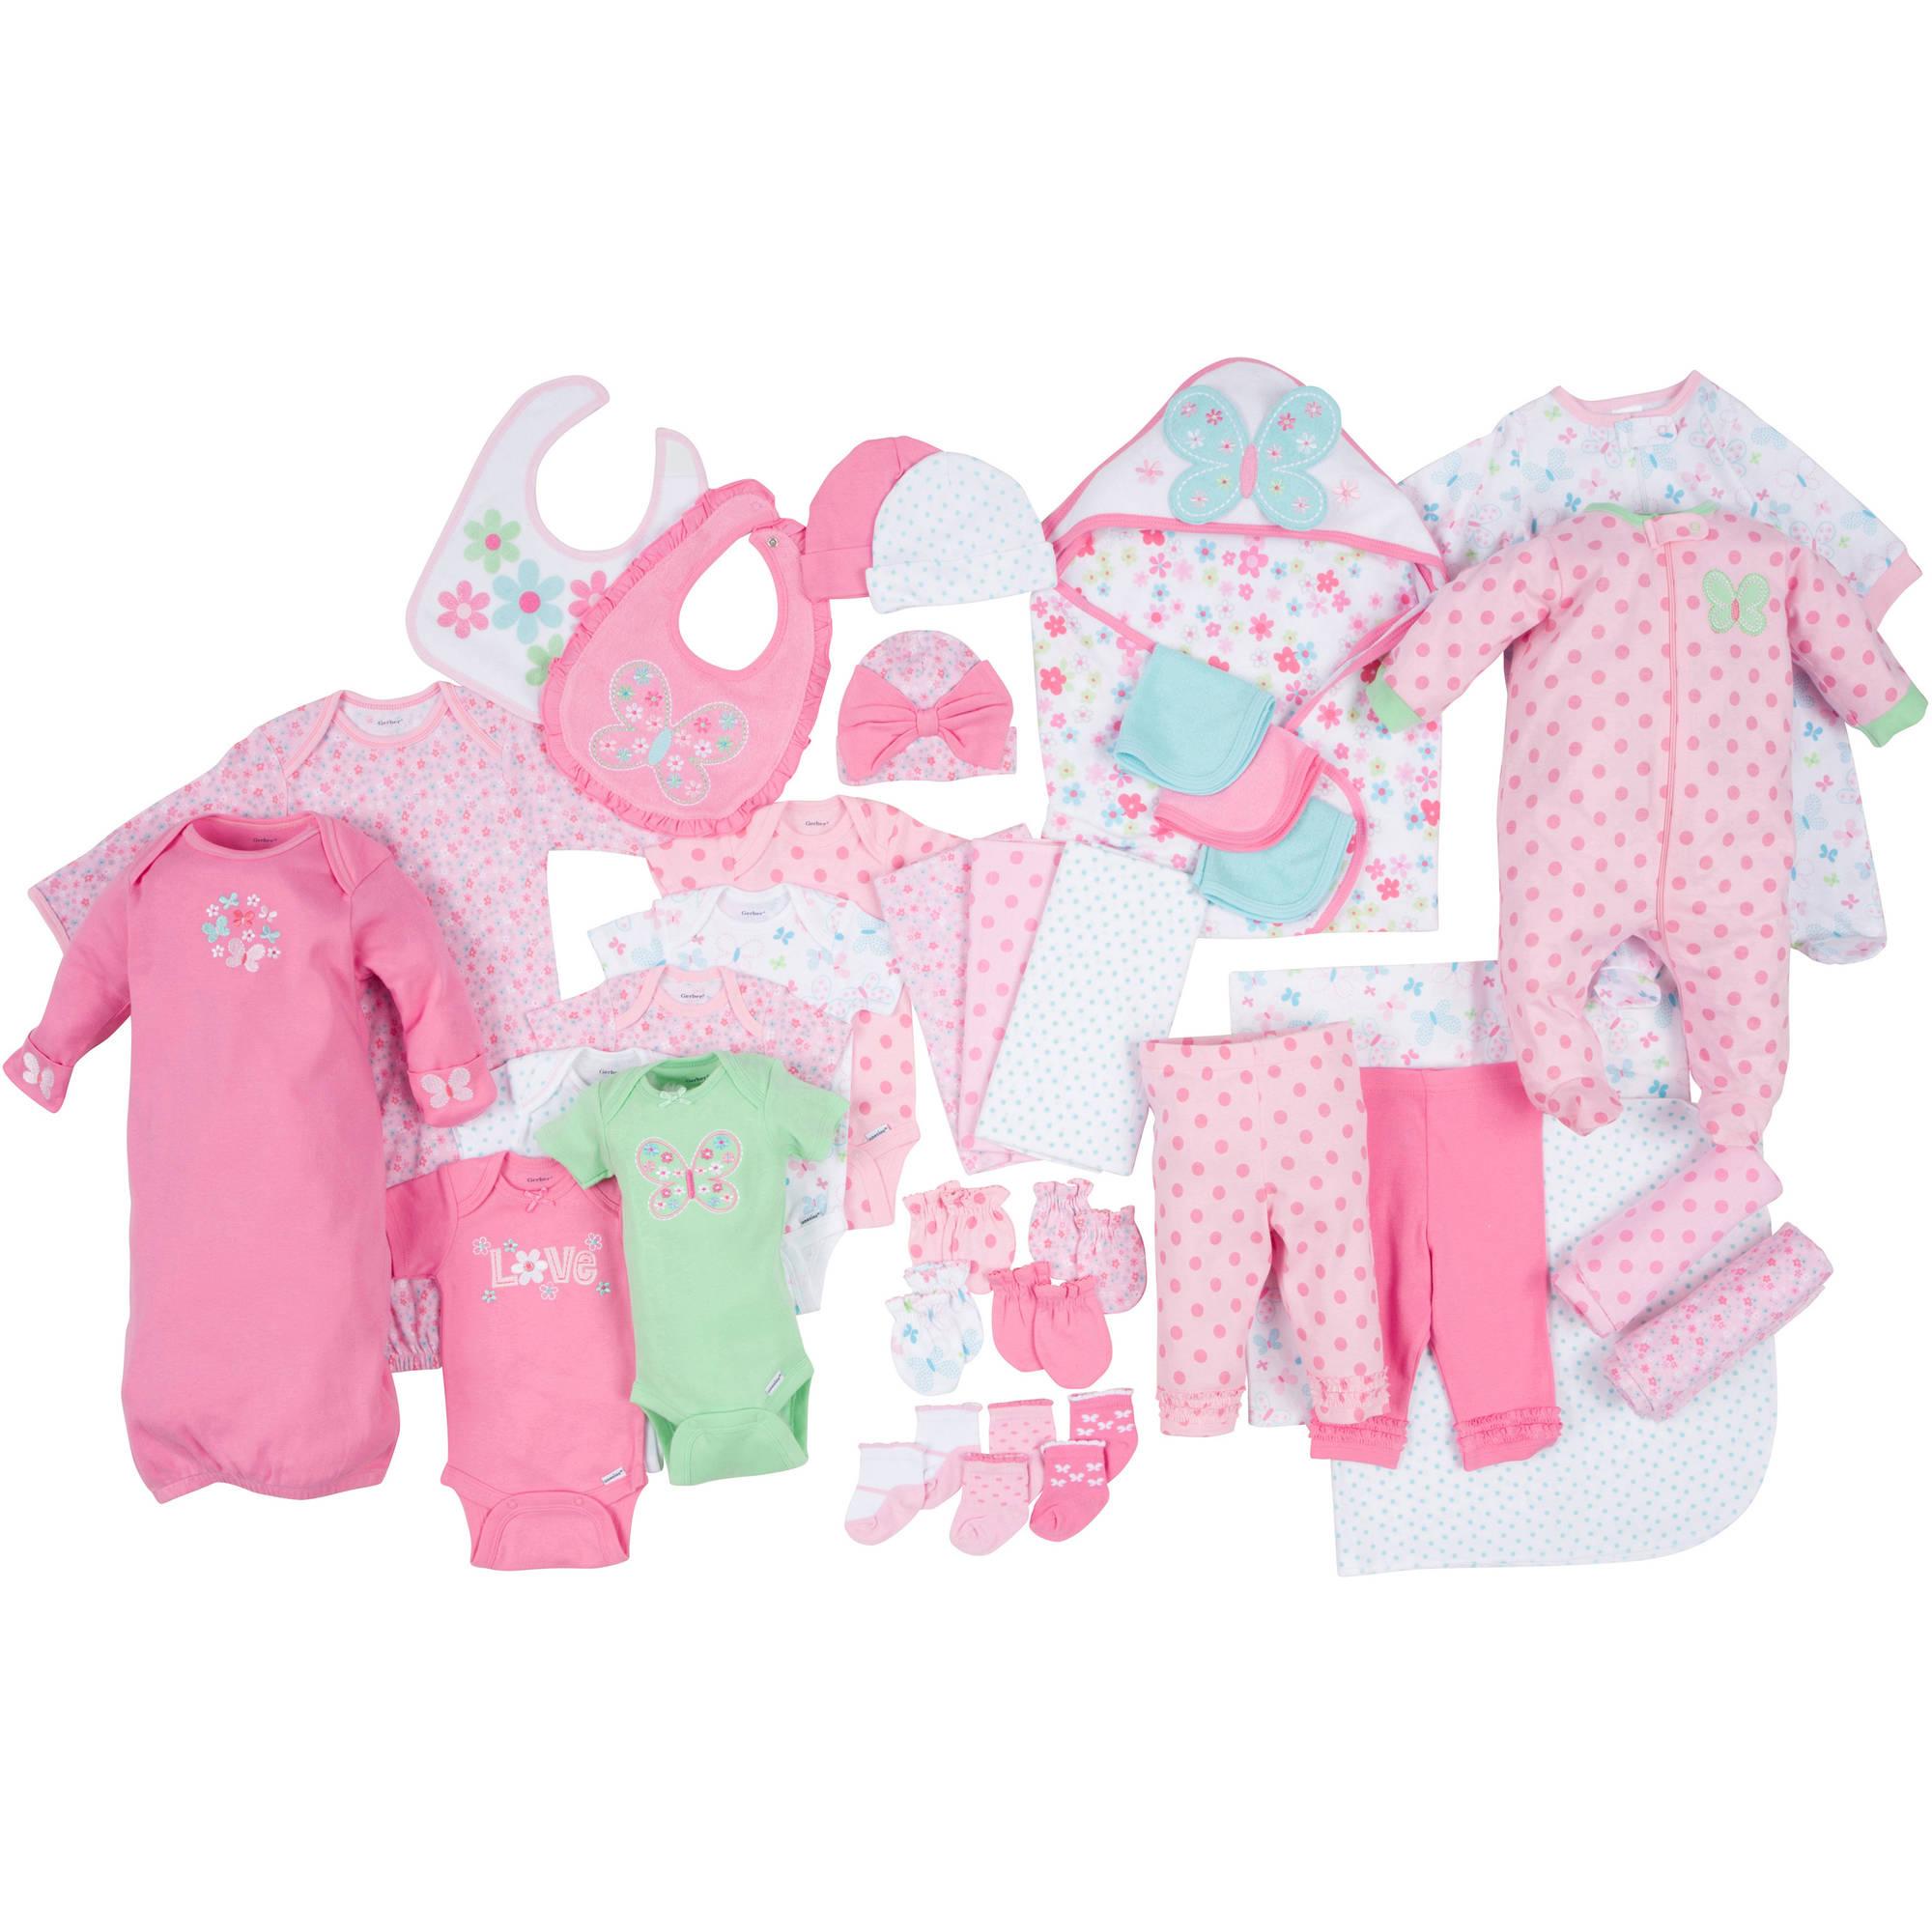 Gerber Newborn Baby Girl Perfect Baby Shower Gift Layette Set,  33-Piece